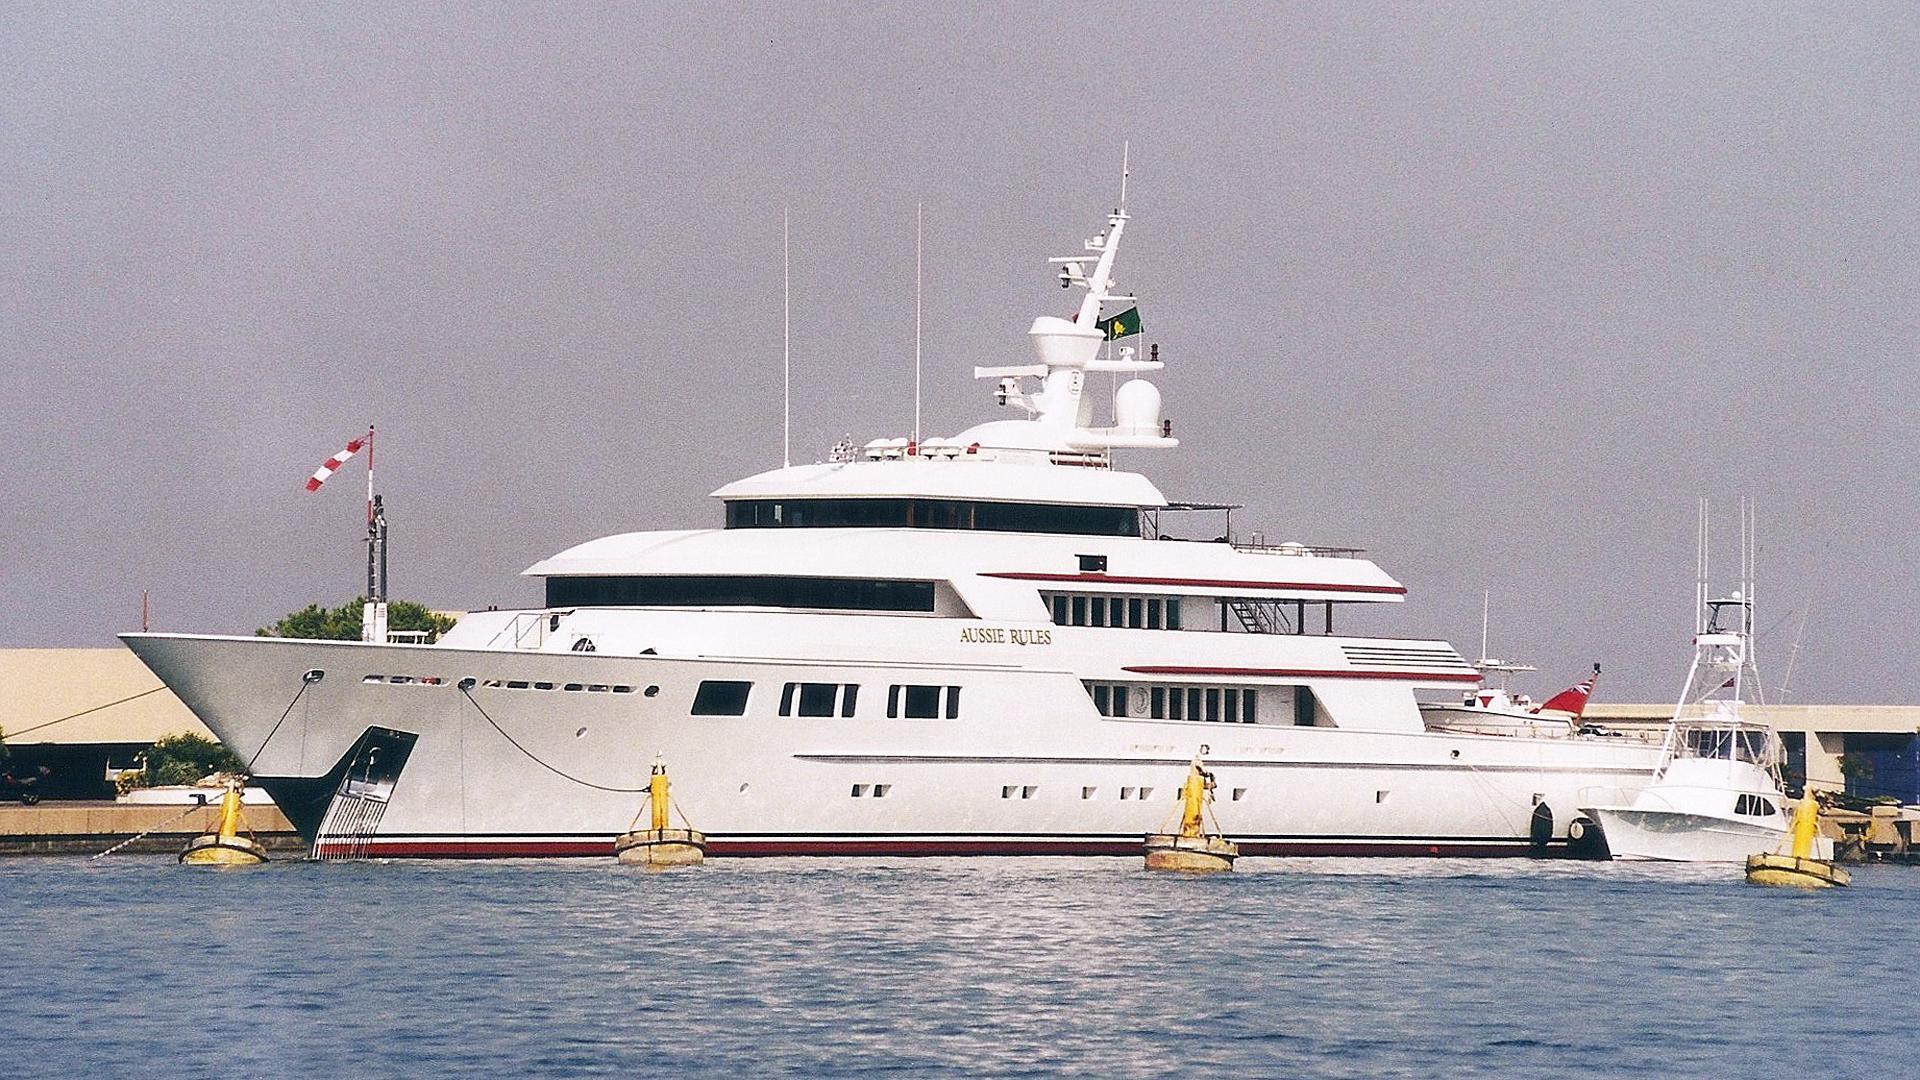 nomad-explorer-yacht-oceanfast-2003-70m-profile-before-refit